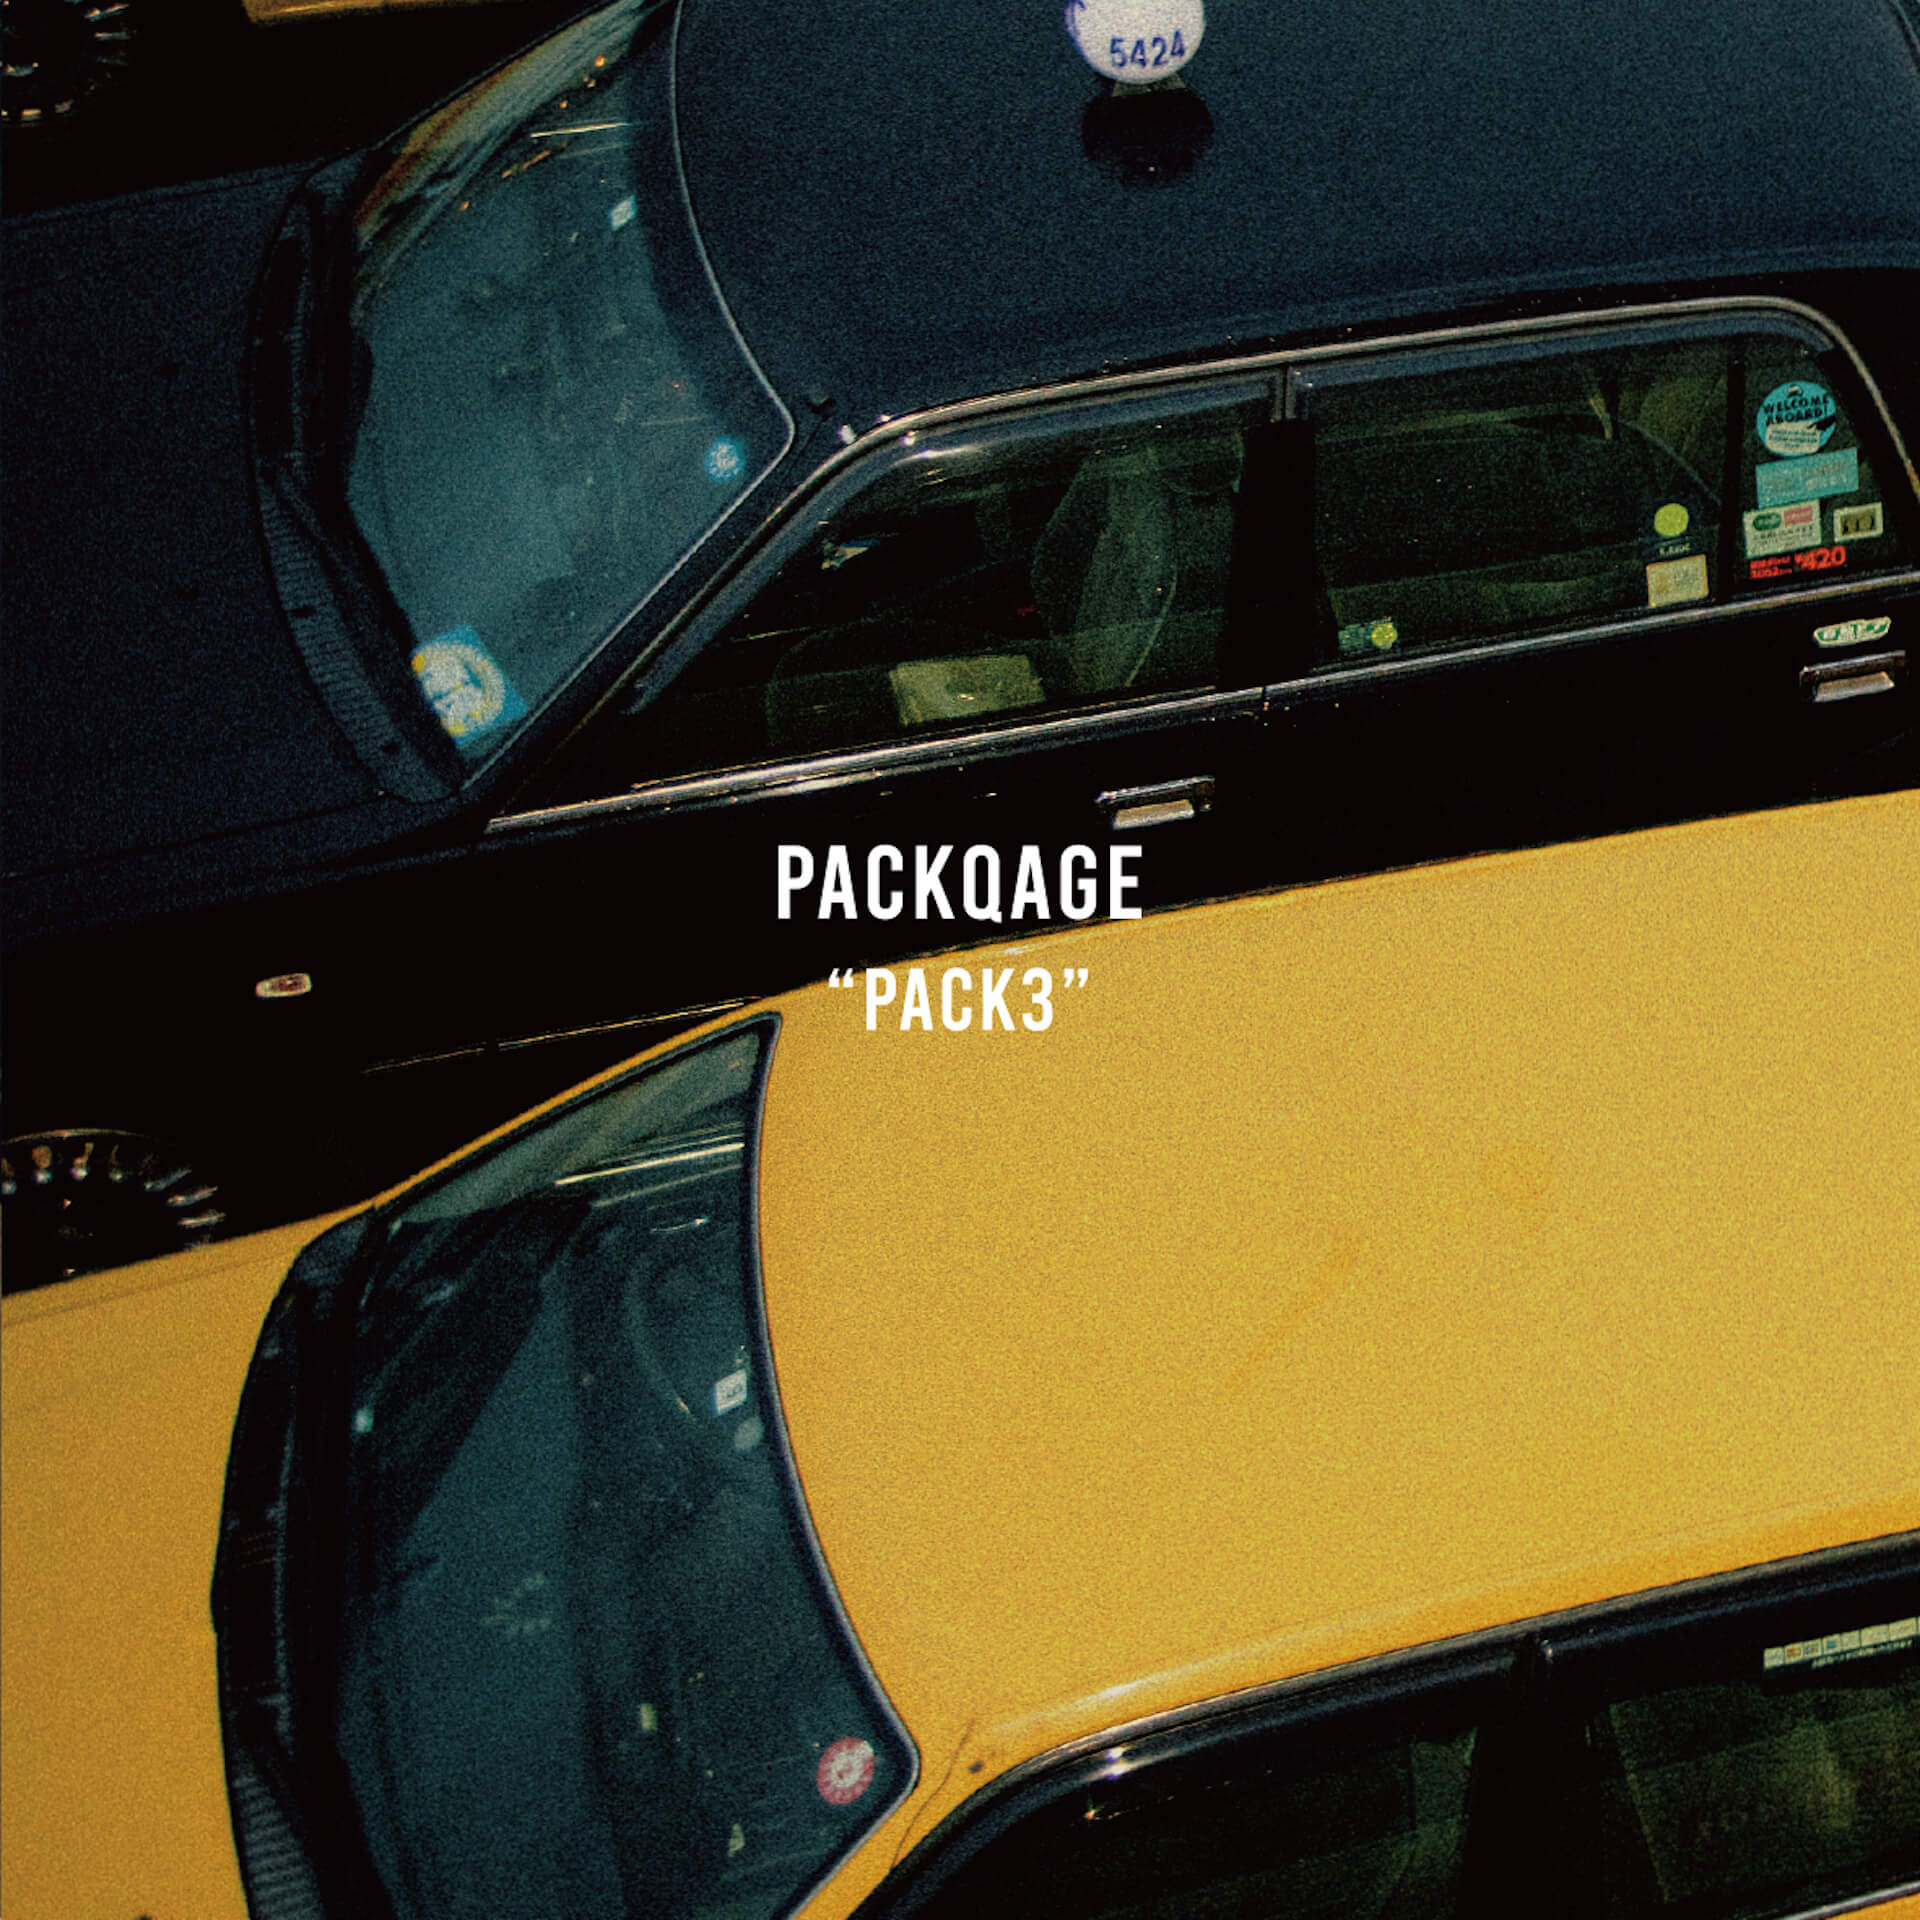 BLABLA、Vue du monde、m-alが結成したユニット・PACK3のデビュー・アルバム 『PACKQAGE』 が本日リリース!客演にはKANDYTOWN・DIAN&MUDやOMSBらが参加 music2020124_pack3_packqage_2